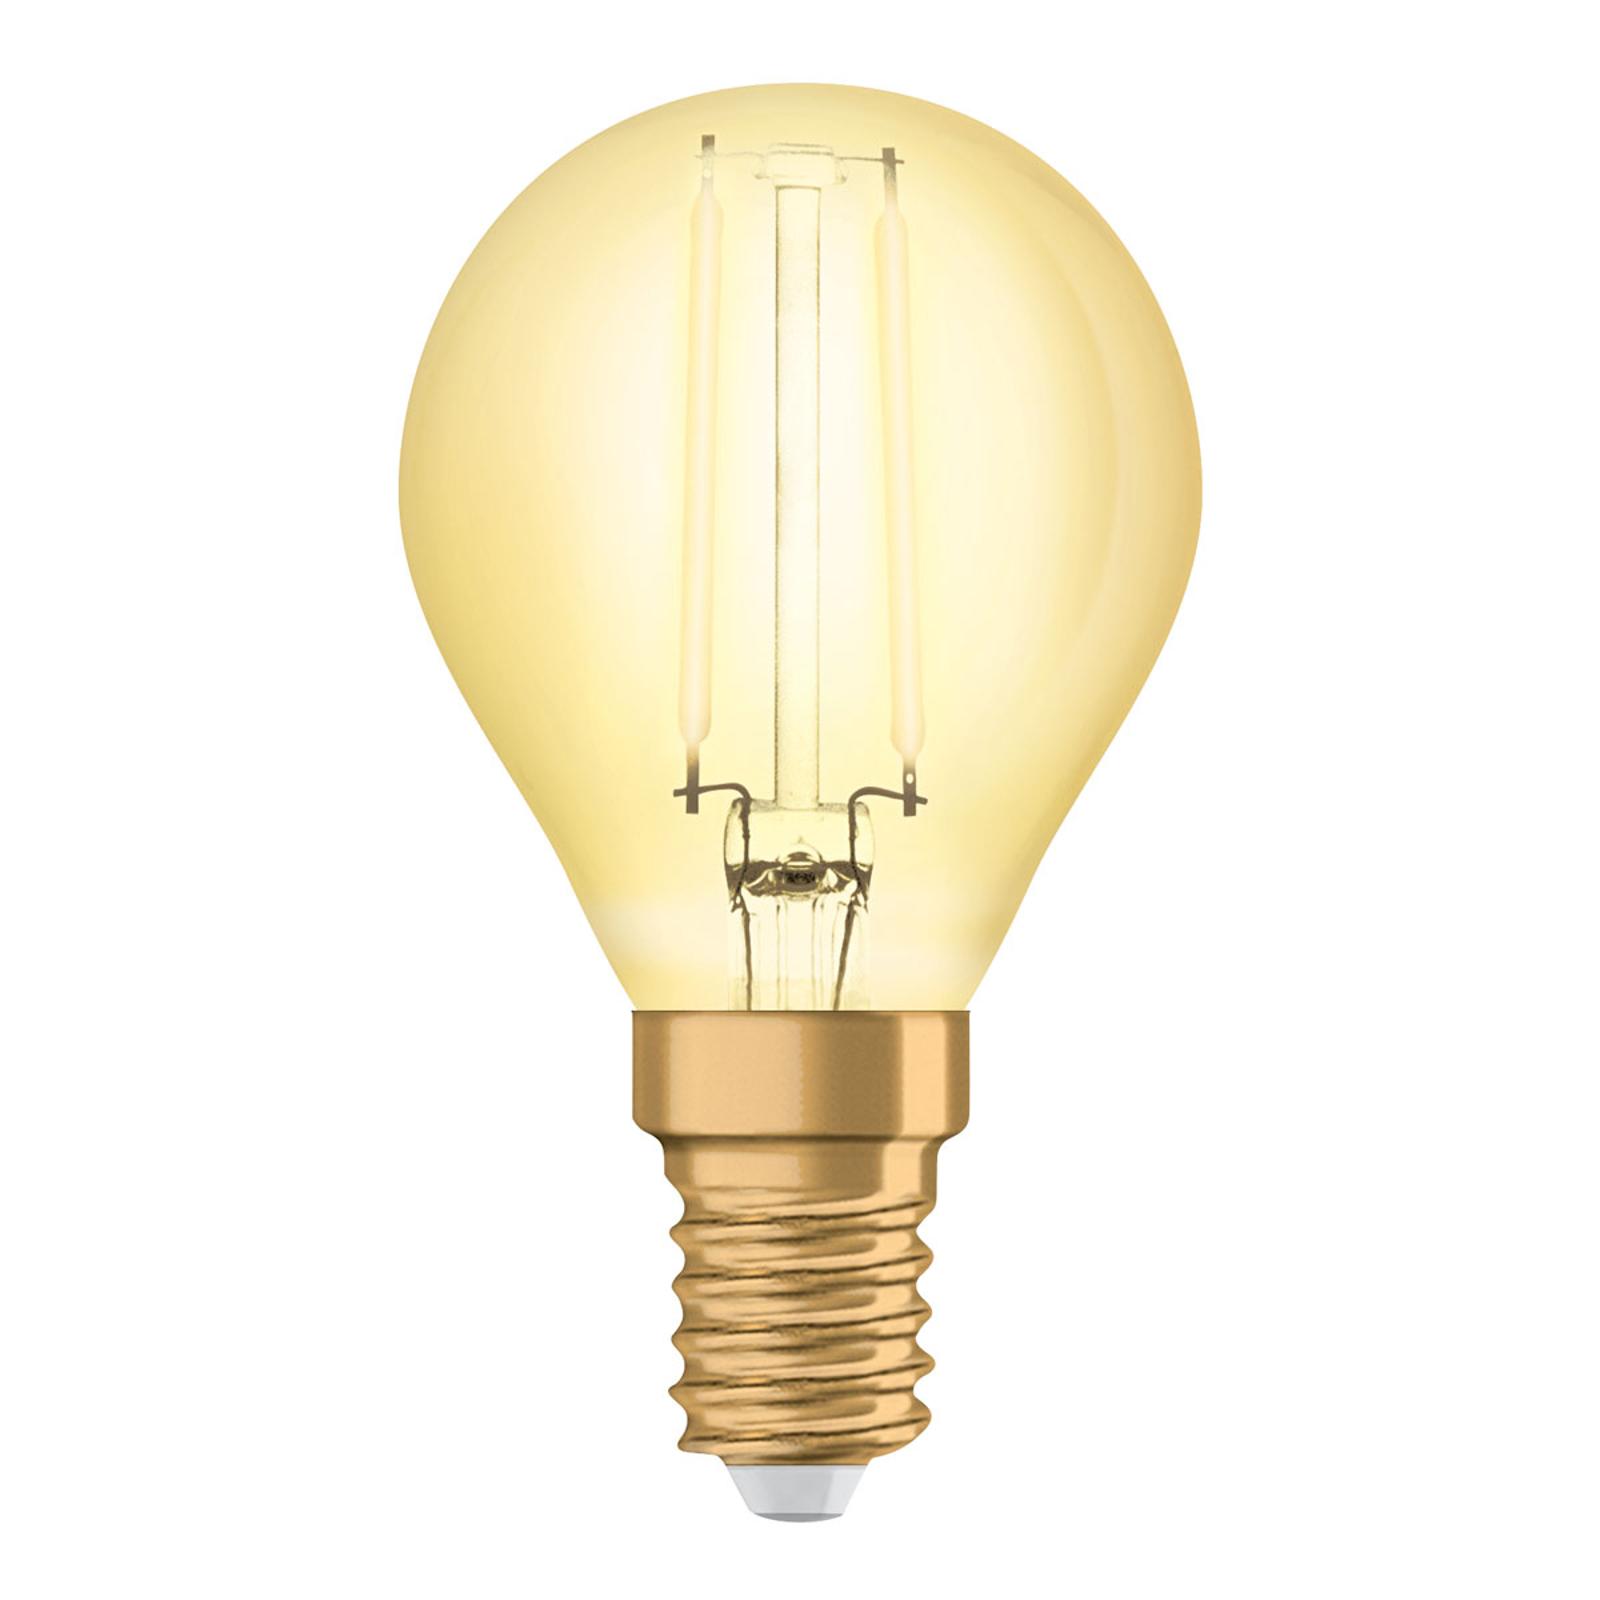 OSRAM-LED-pisara E14 4W Vintage Classic P gold